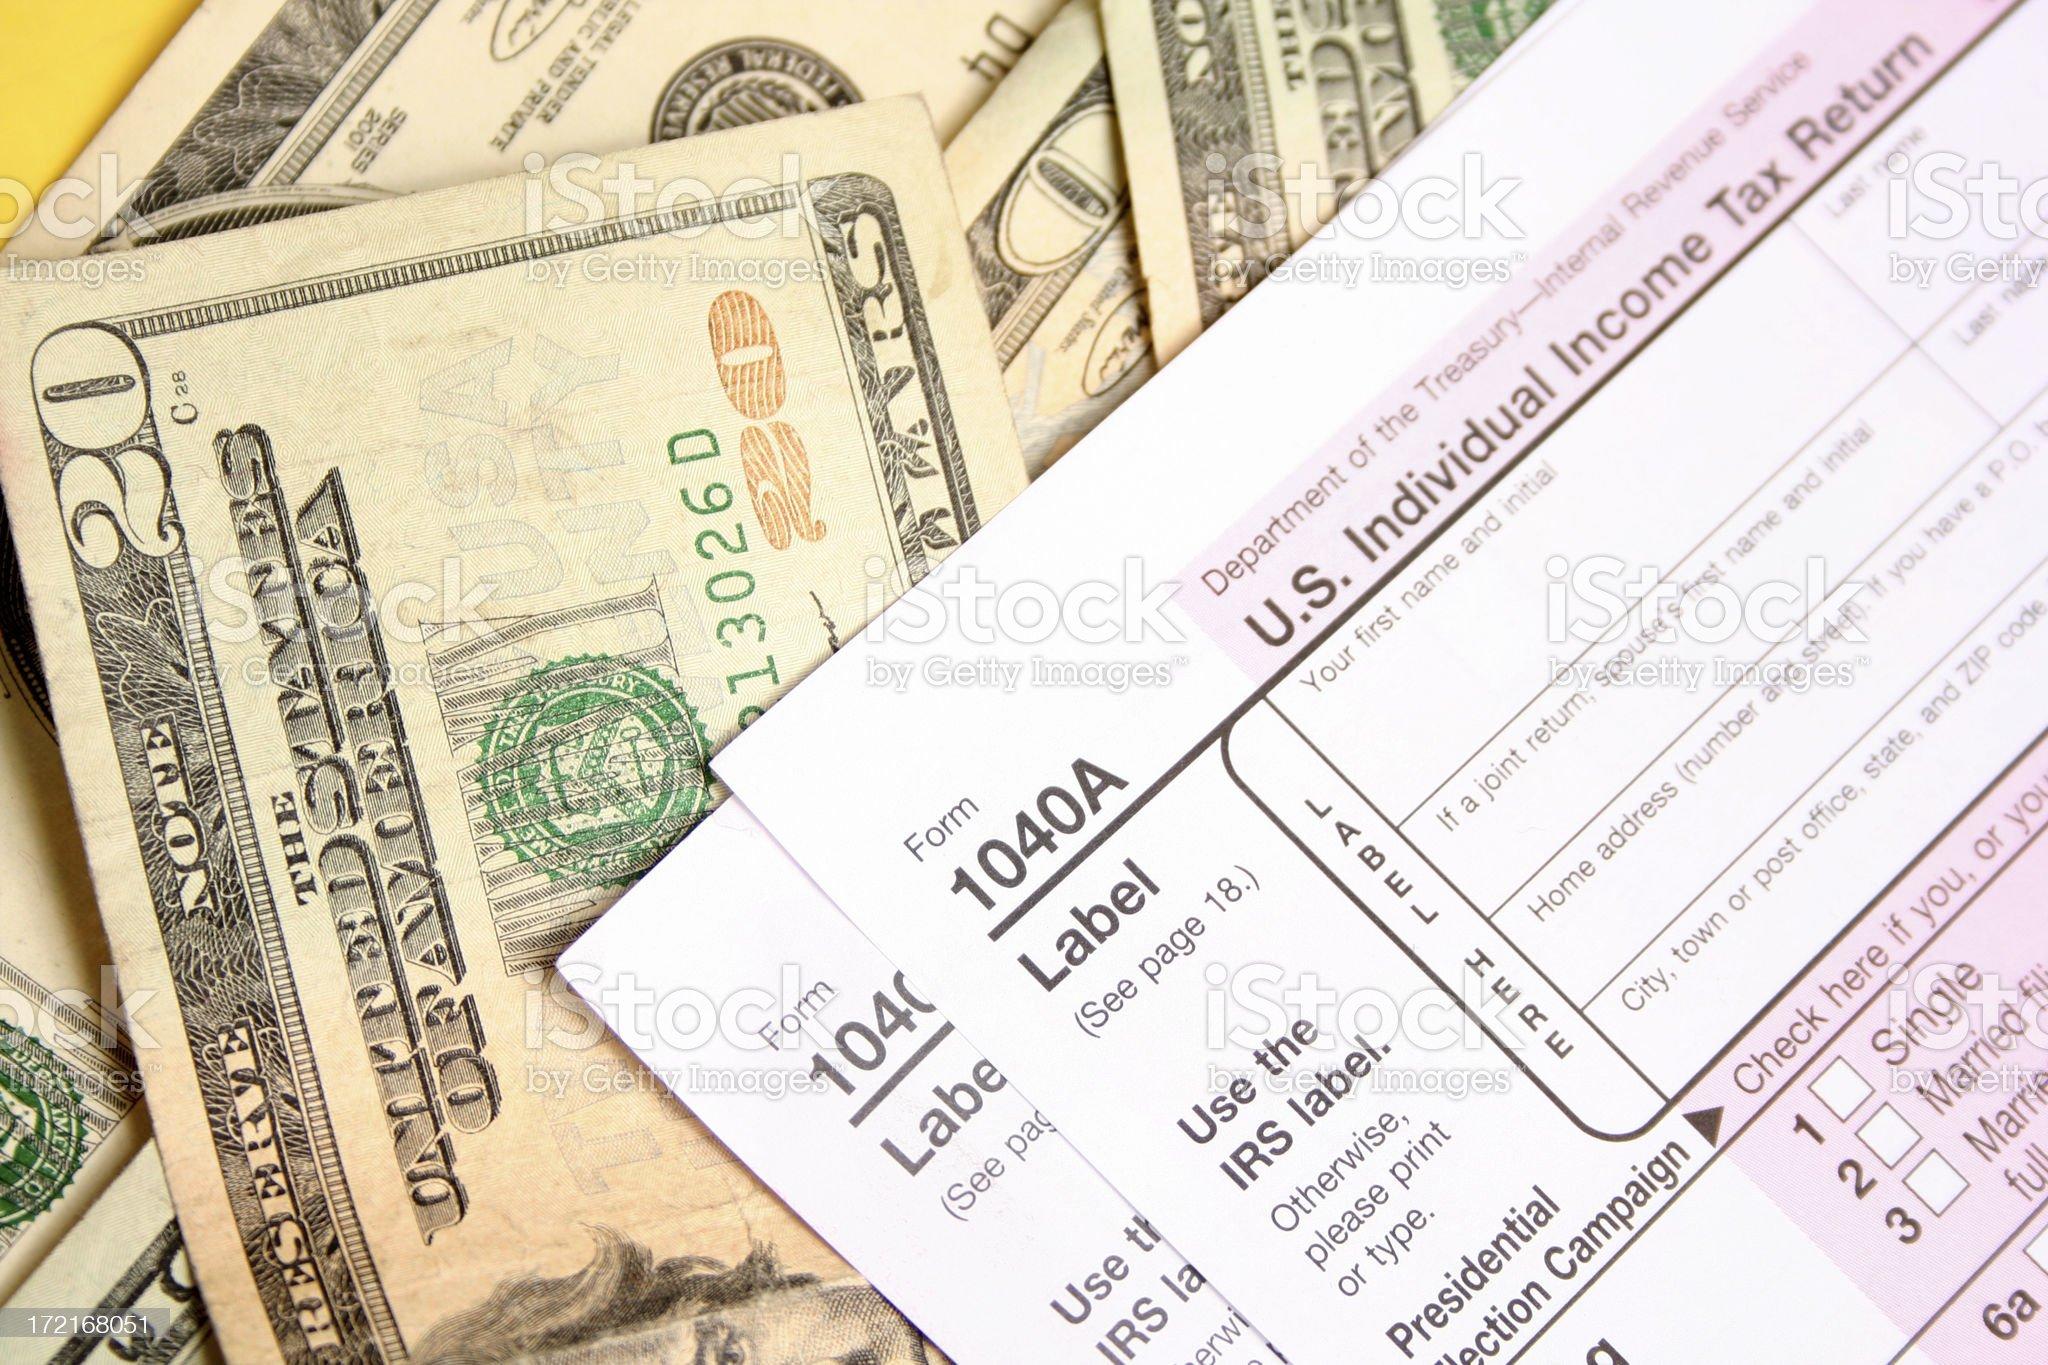 Tax Form on Money royalty-free stock photo